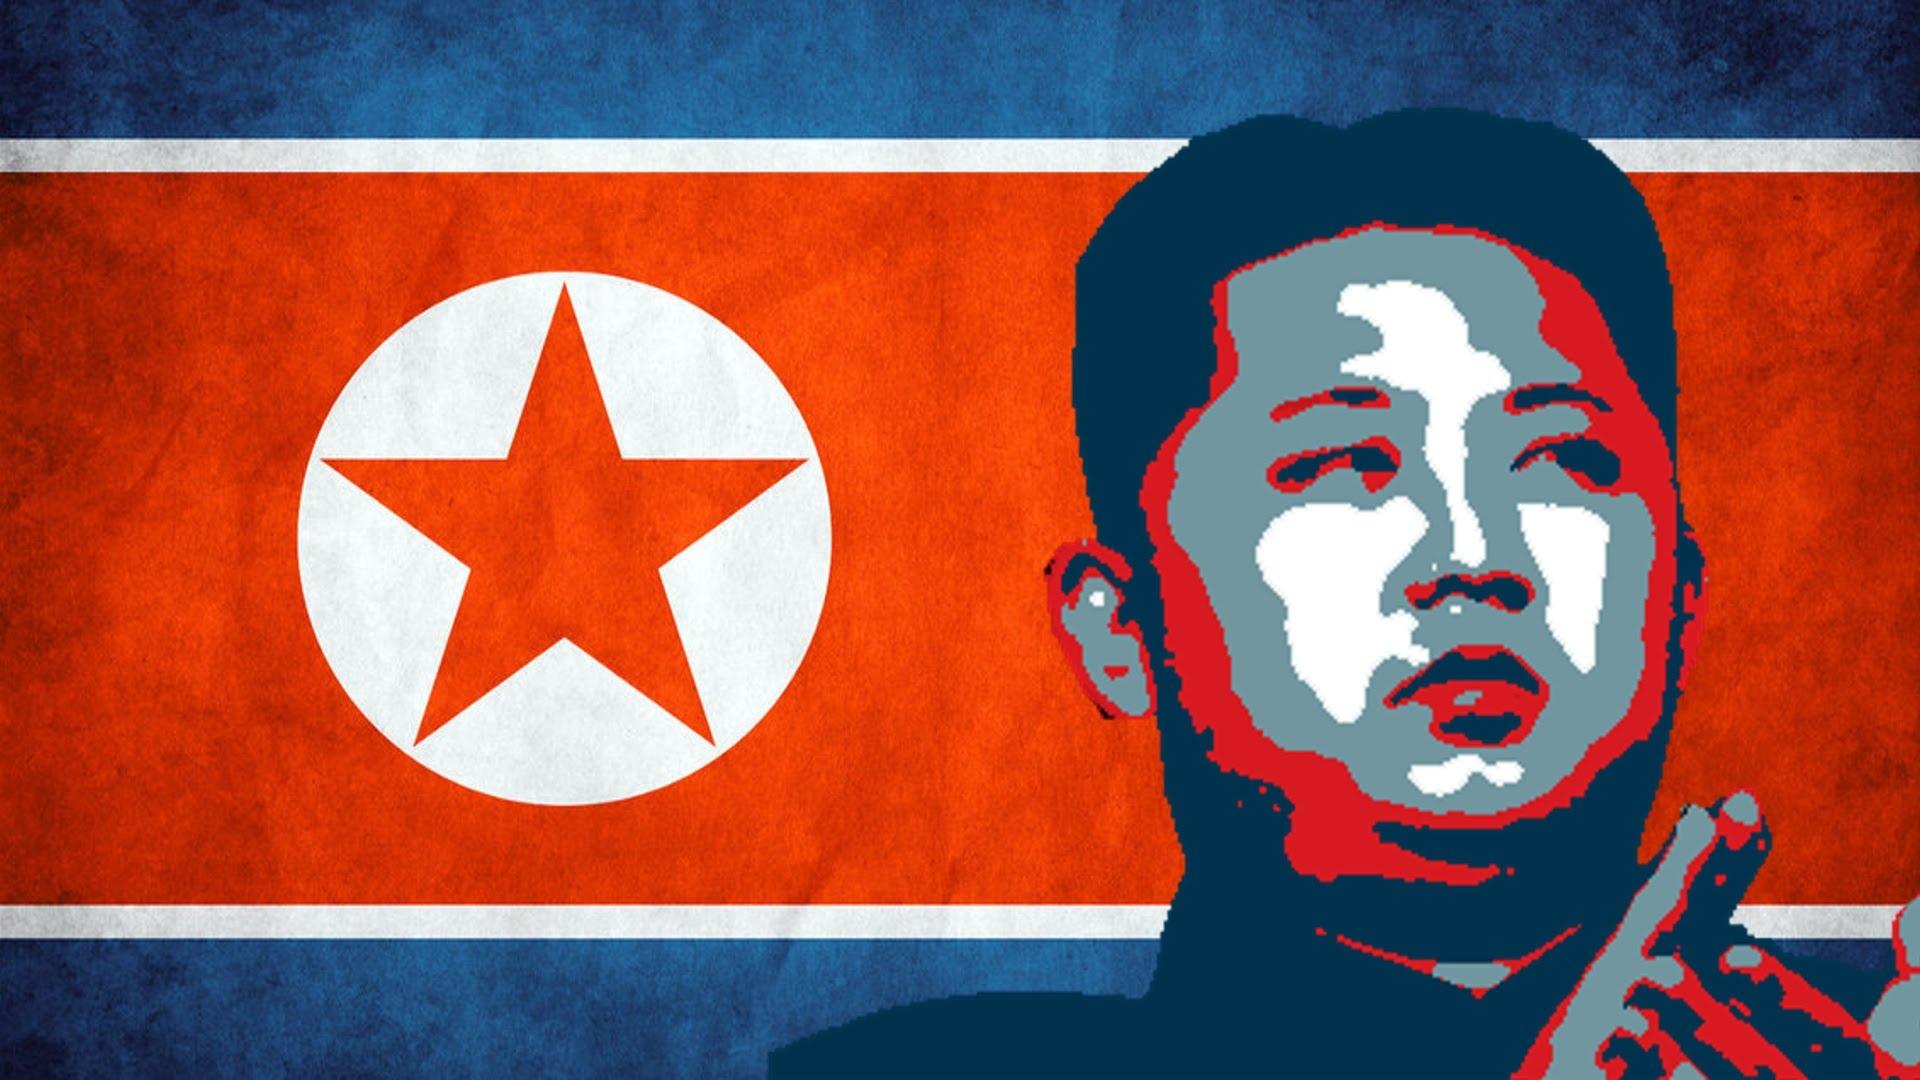 Corea del Norte: Un mensaje secreto a Washington